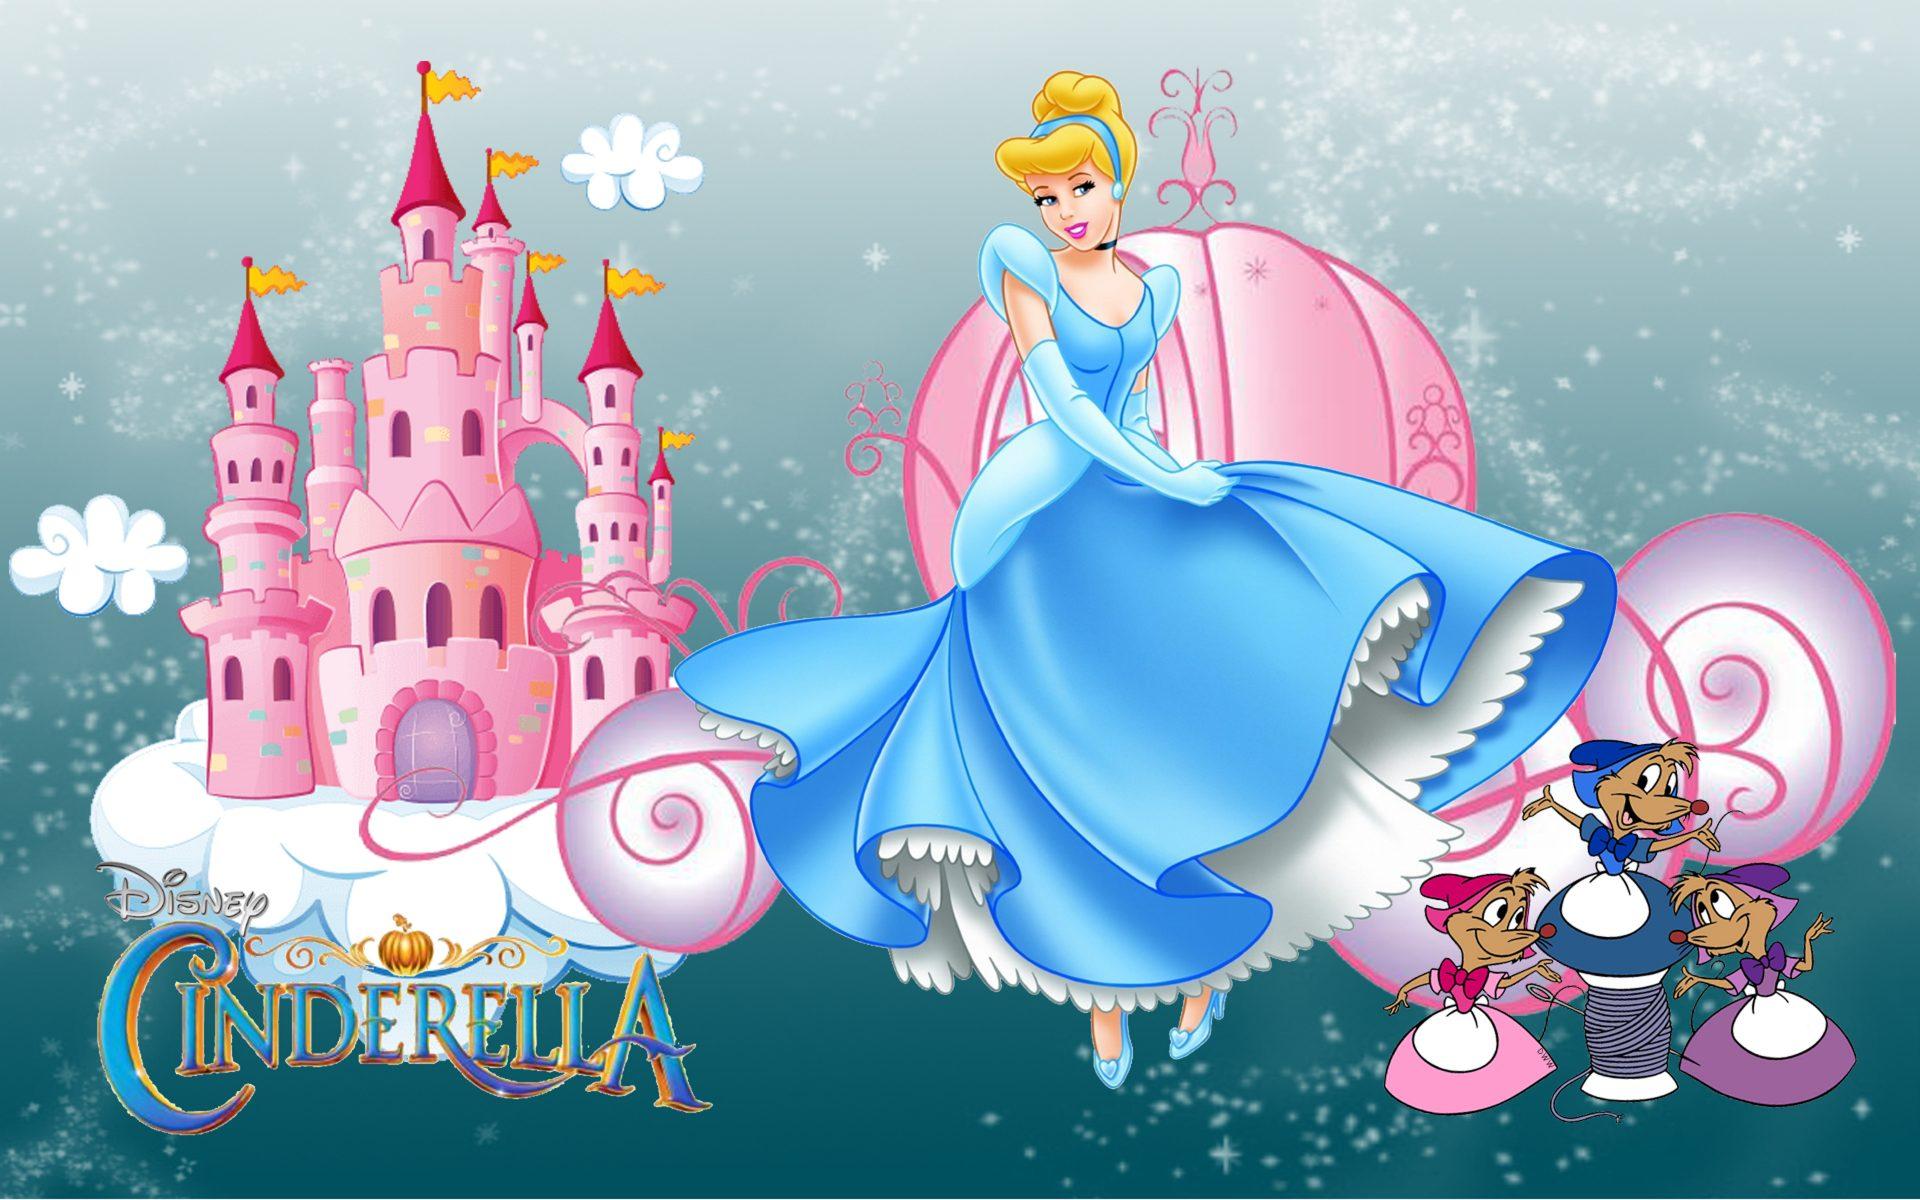 Hd Fairies Wallpaper Free Mobile Dwnld